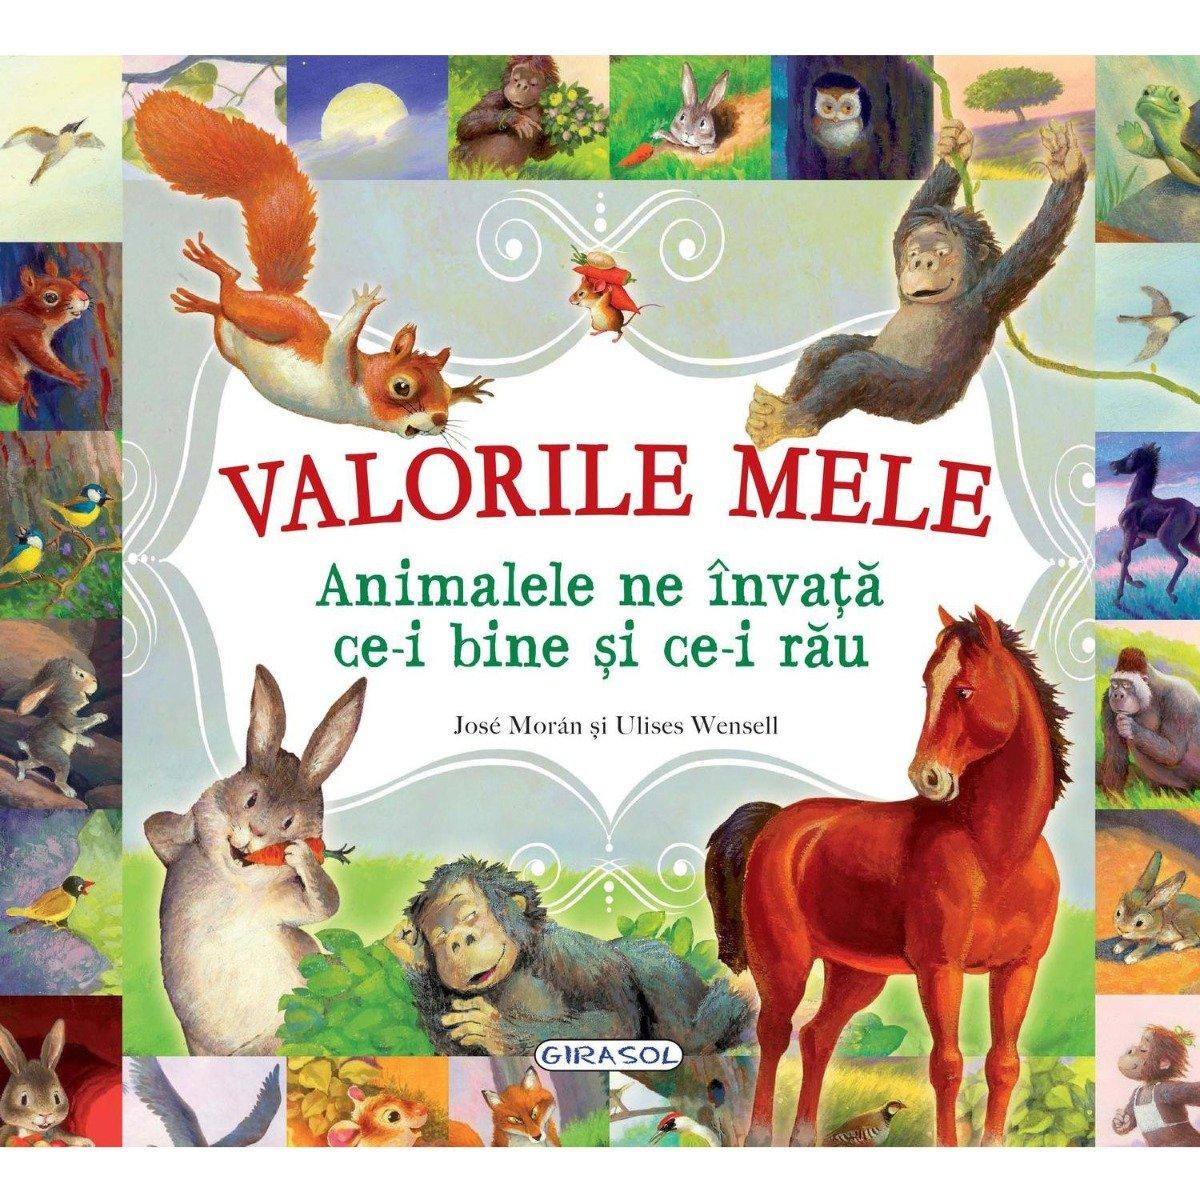 Carte Girasol - Valorile Mele - Animalele ne invata ce-i bine si ce-i rau